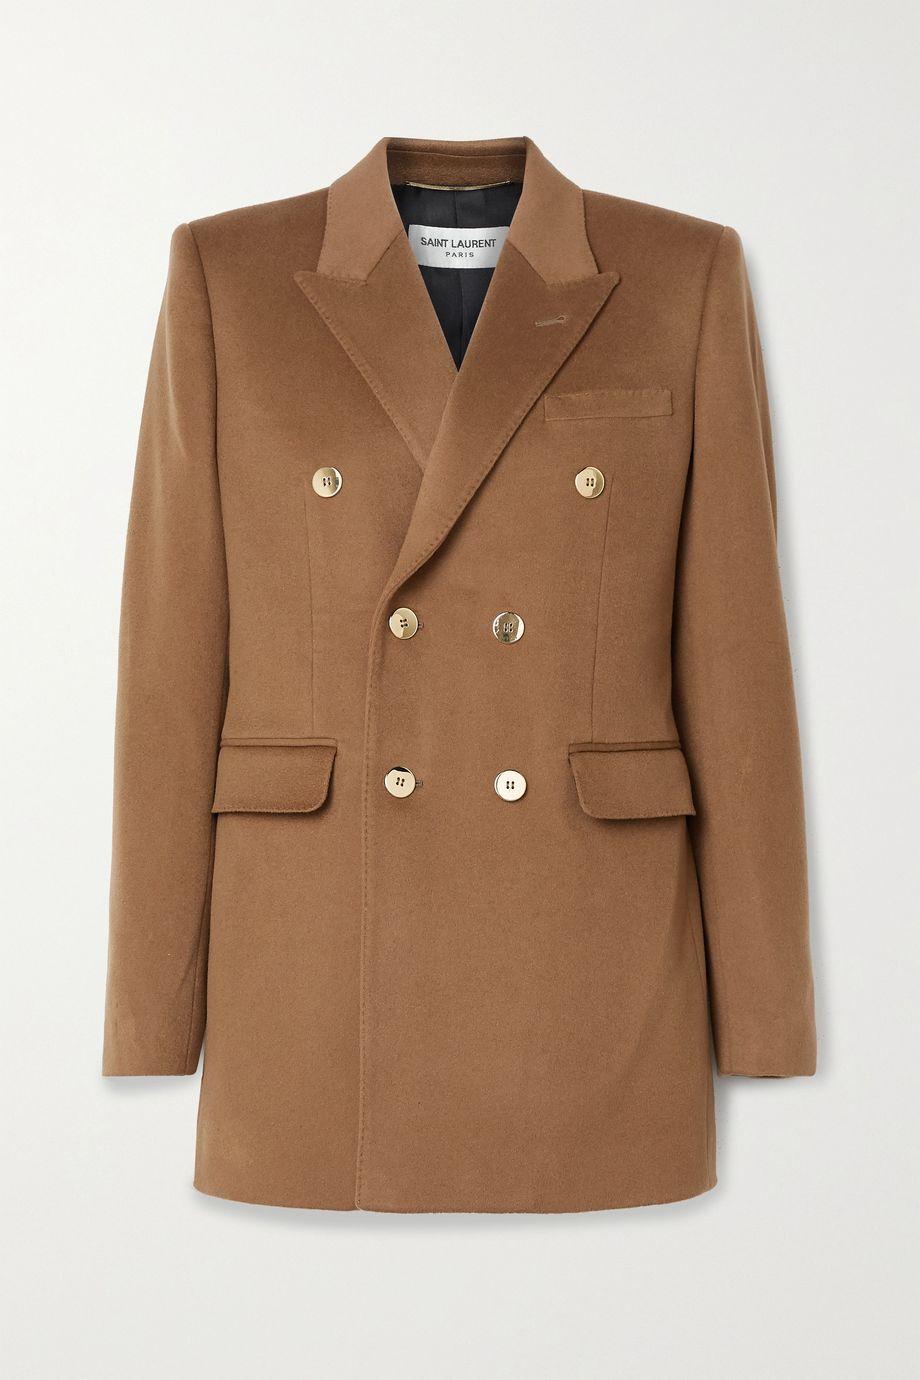 SAINT LAURENT Wool and cashmere-blend blazer